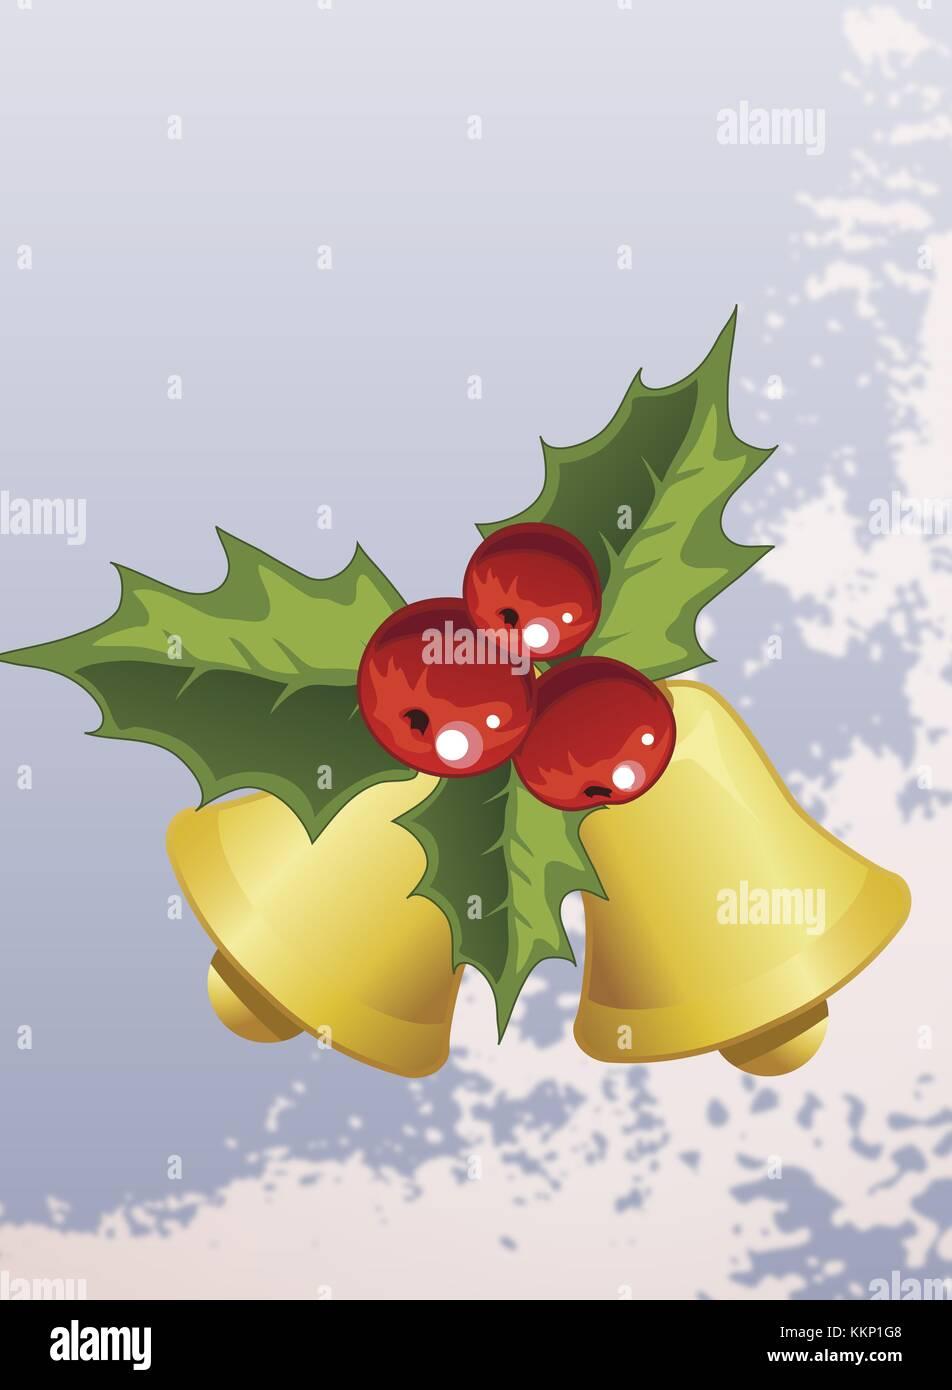 christmas bells clip art - Stock Image